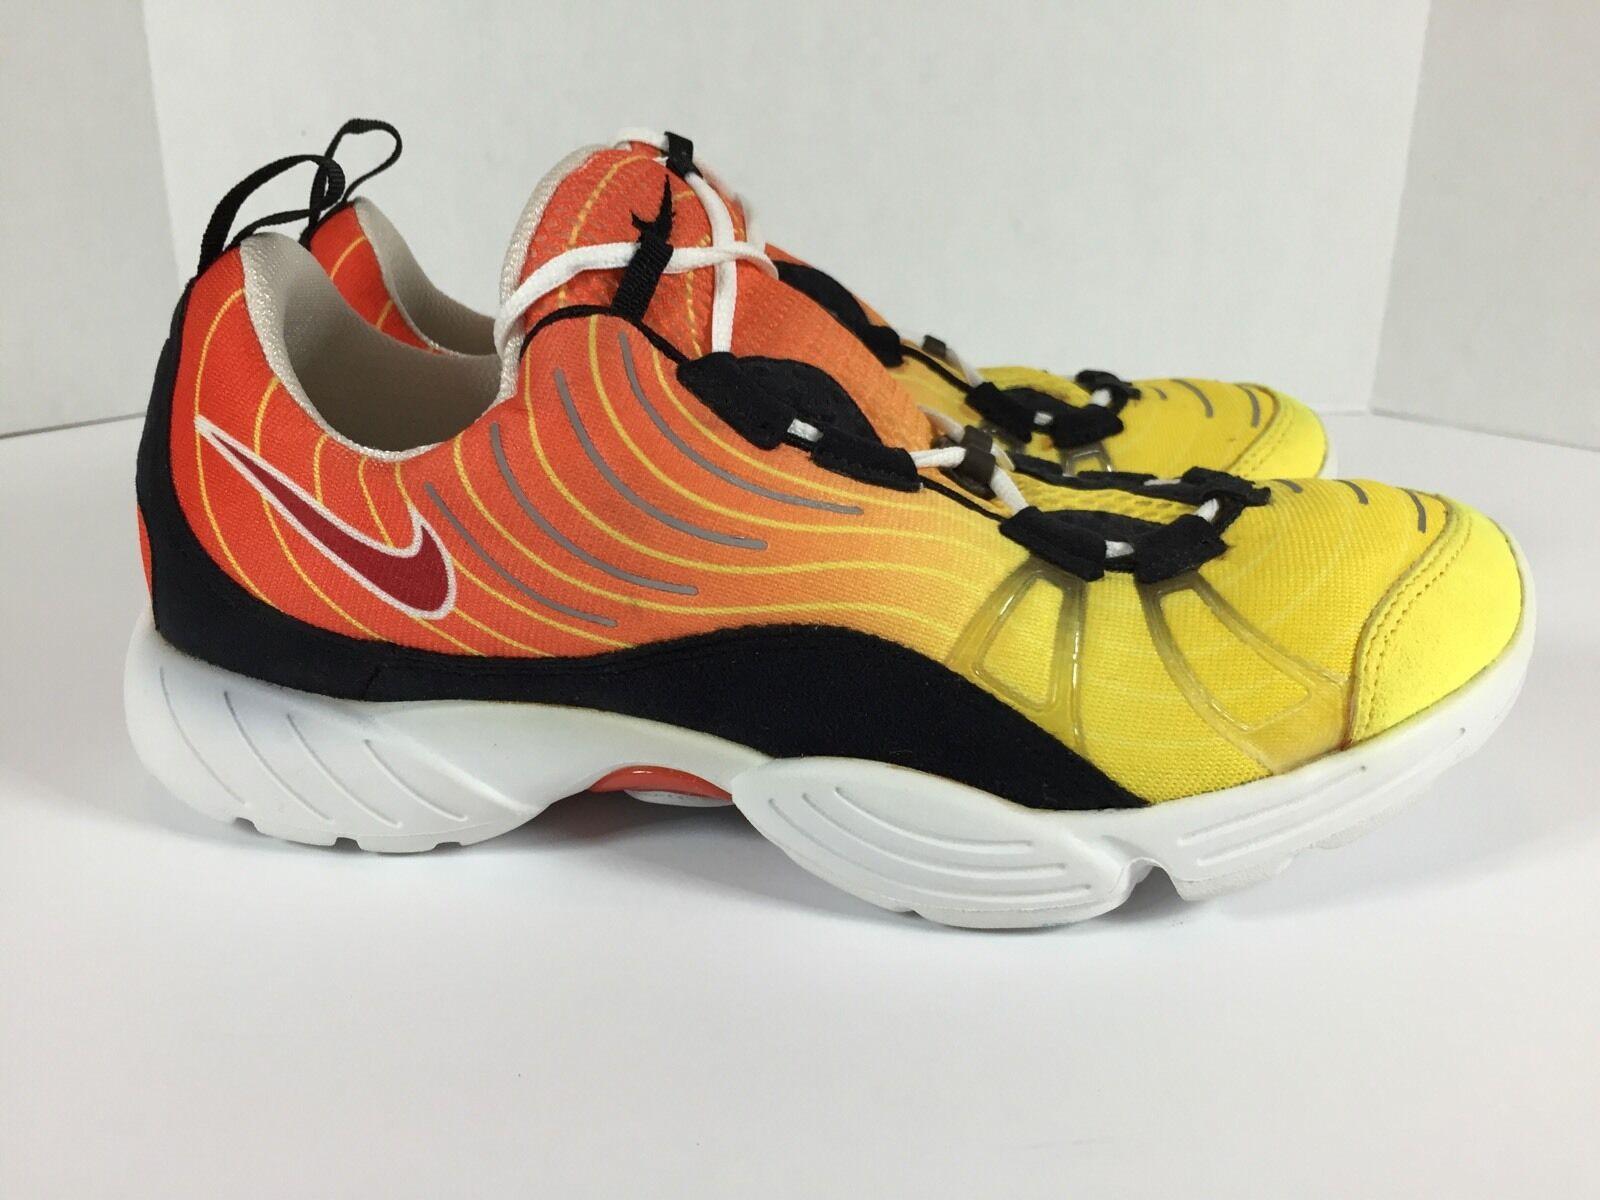 1-of-1 SAMPLE Nike Sock Flame   9   DS   Air Max 1 90 97 QS Presto